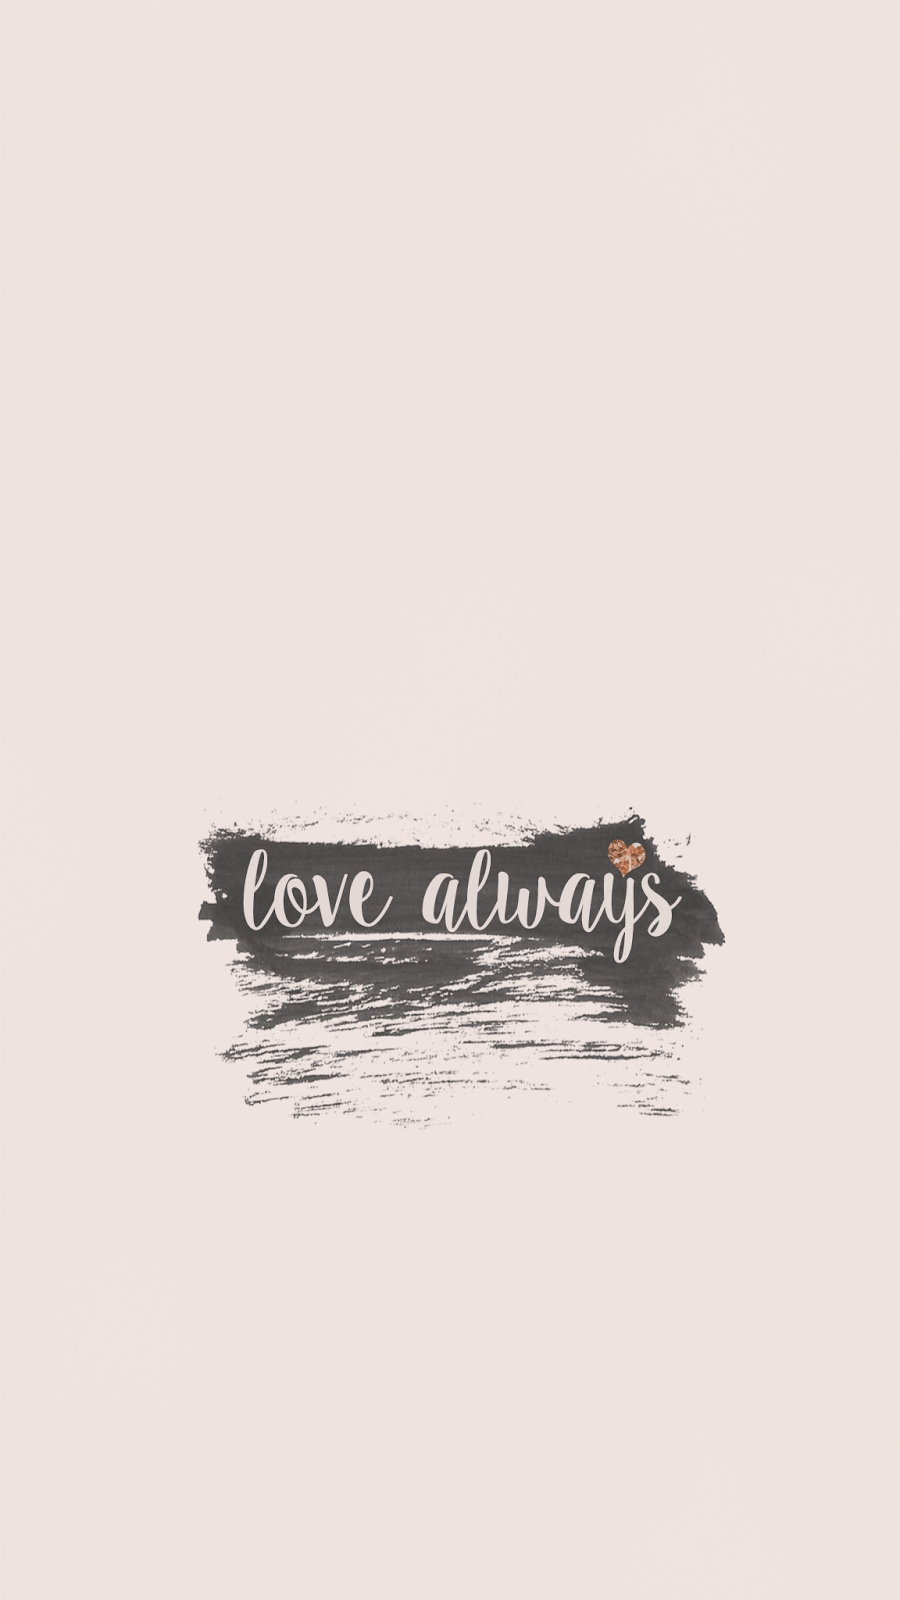 Loubecca Age Tumblr Iphone Wallpaper Valentines Wallpaper - Quote Love Wallpaper Iphone , HD Wallpaper & Backgrounds